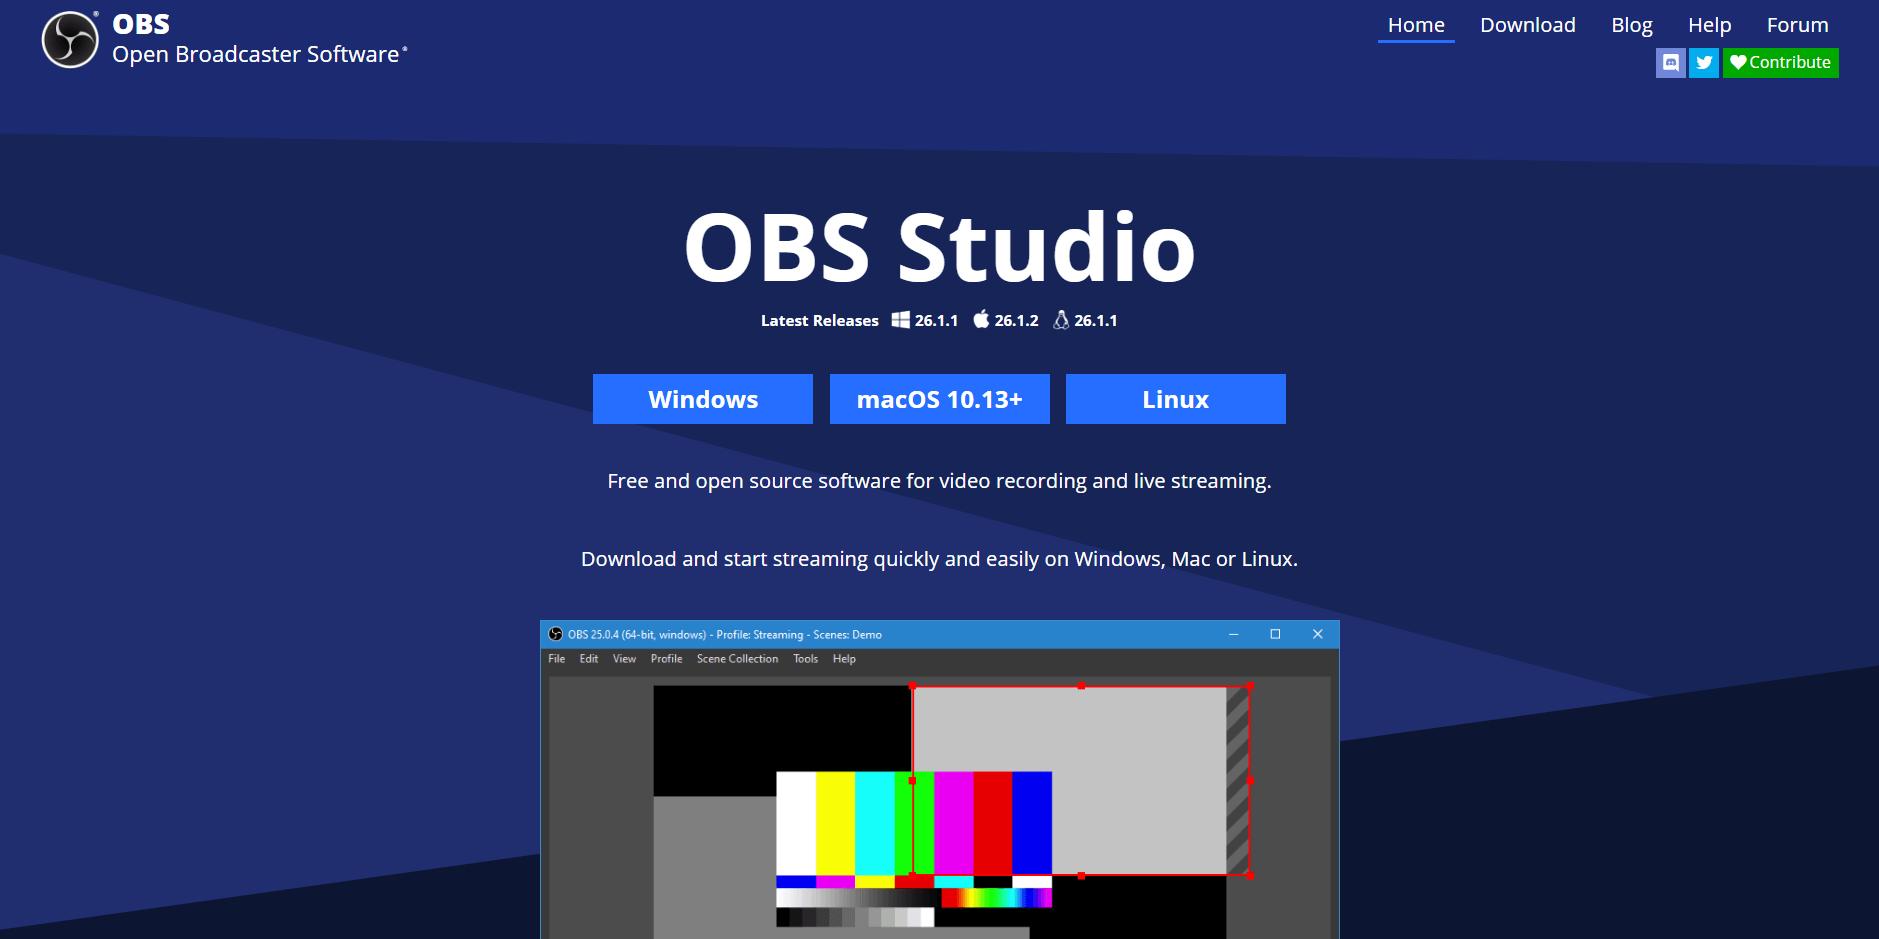 Tải phần mềm livestream OBS Studio tại trang chủ - GEARVN.COM